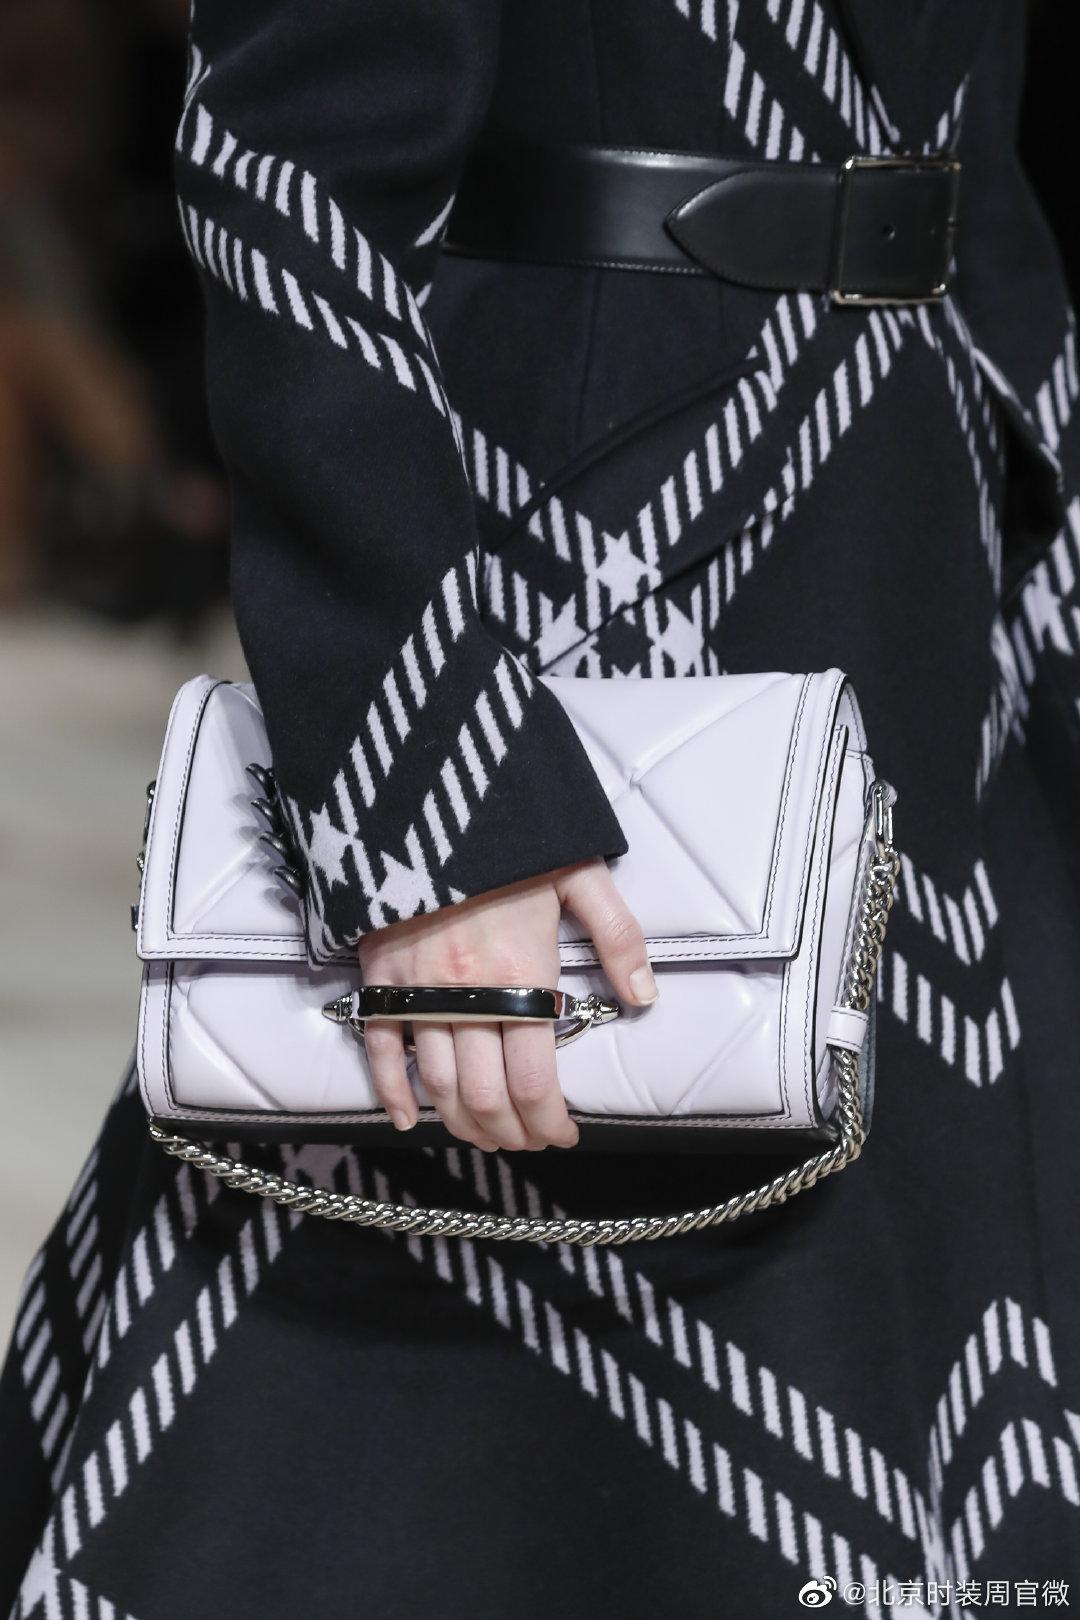 Alexander McQueen 2020秋冬系列推出 The Story手袋和The Story Shou